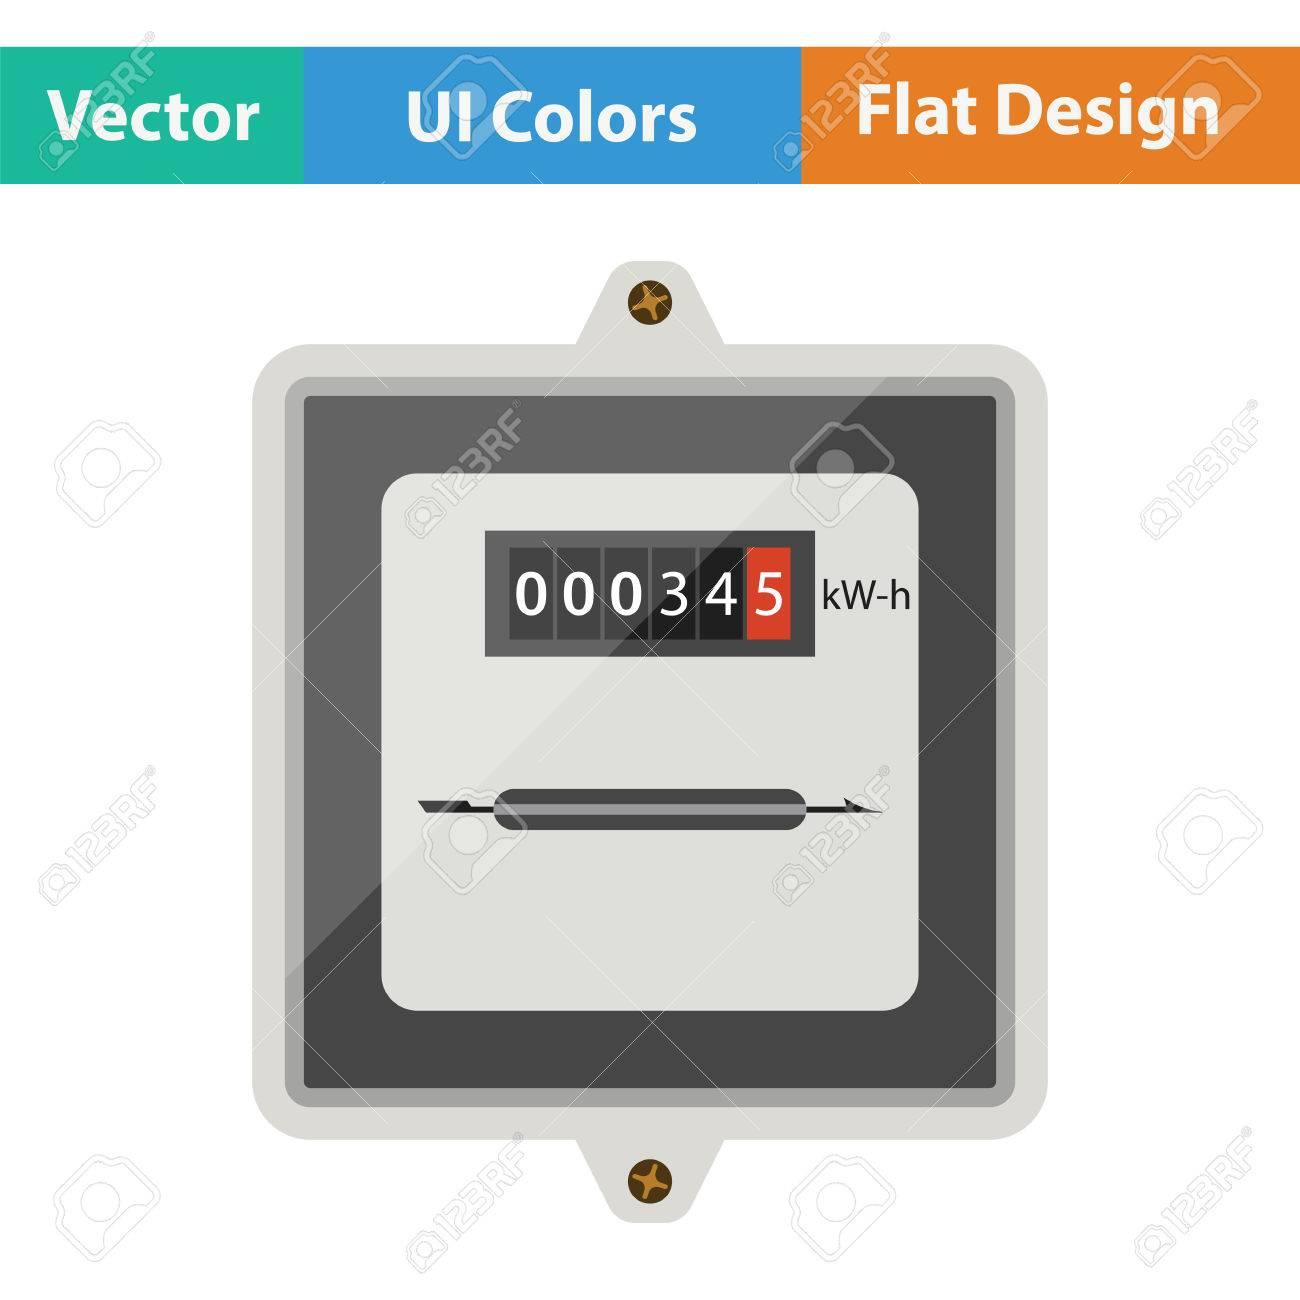 Electric meter icon. Flat design. Vector illustration. - 75342525